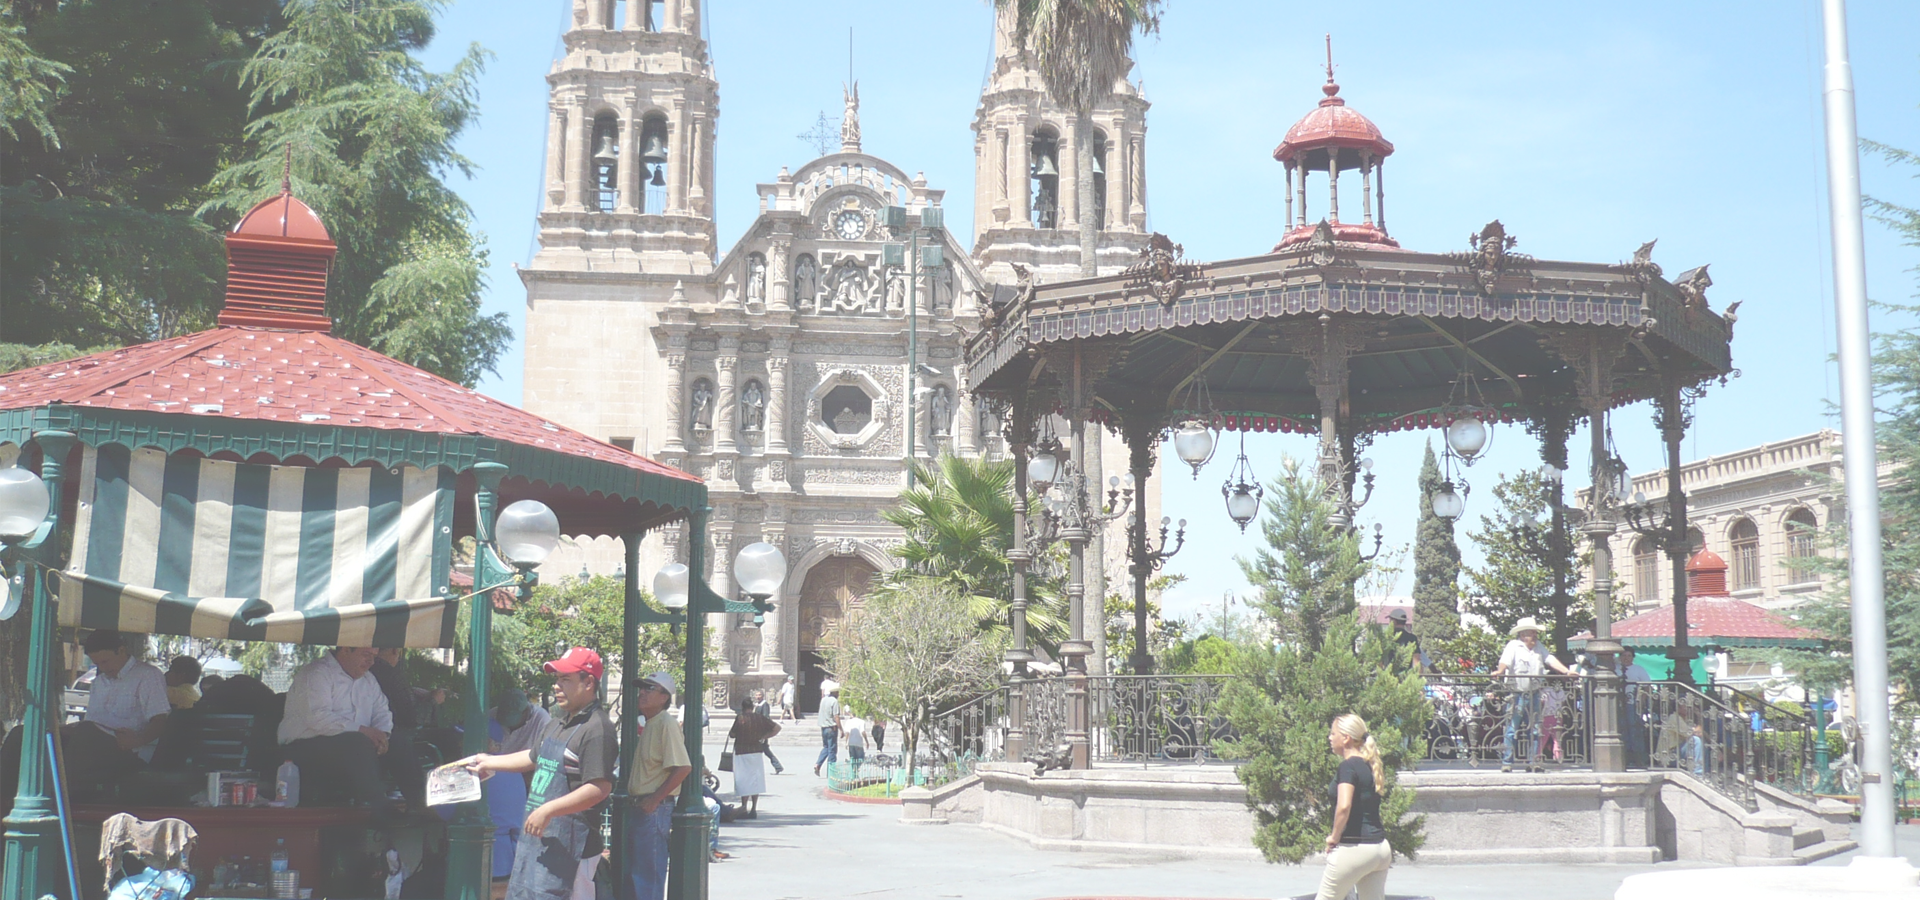 Peer-to-peer advisory in Chihuahua, Mexico